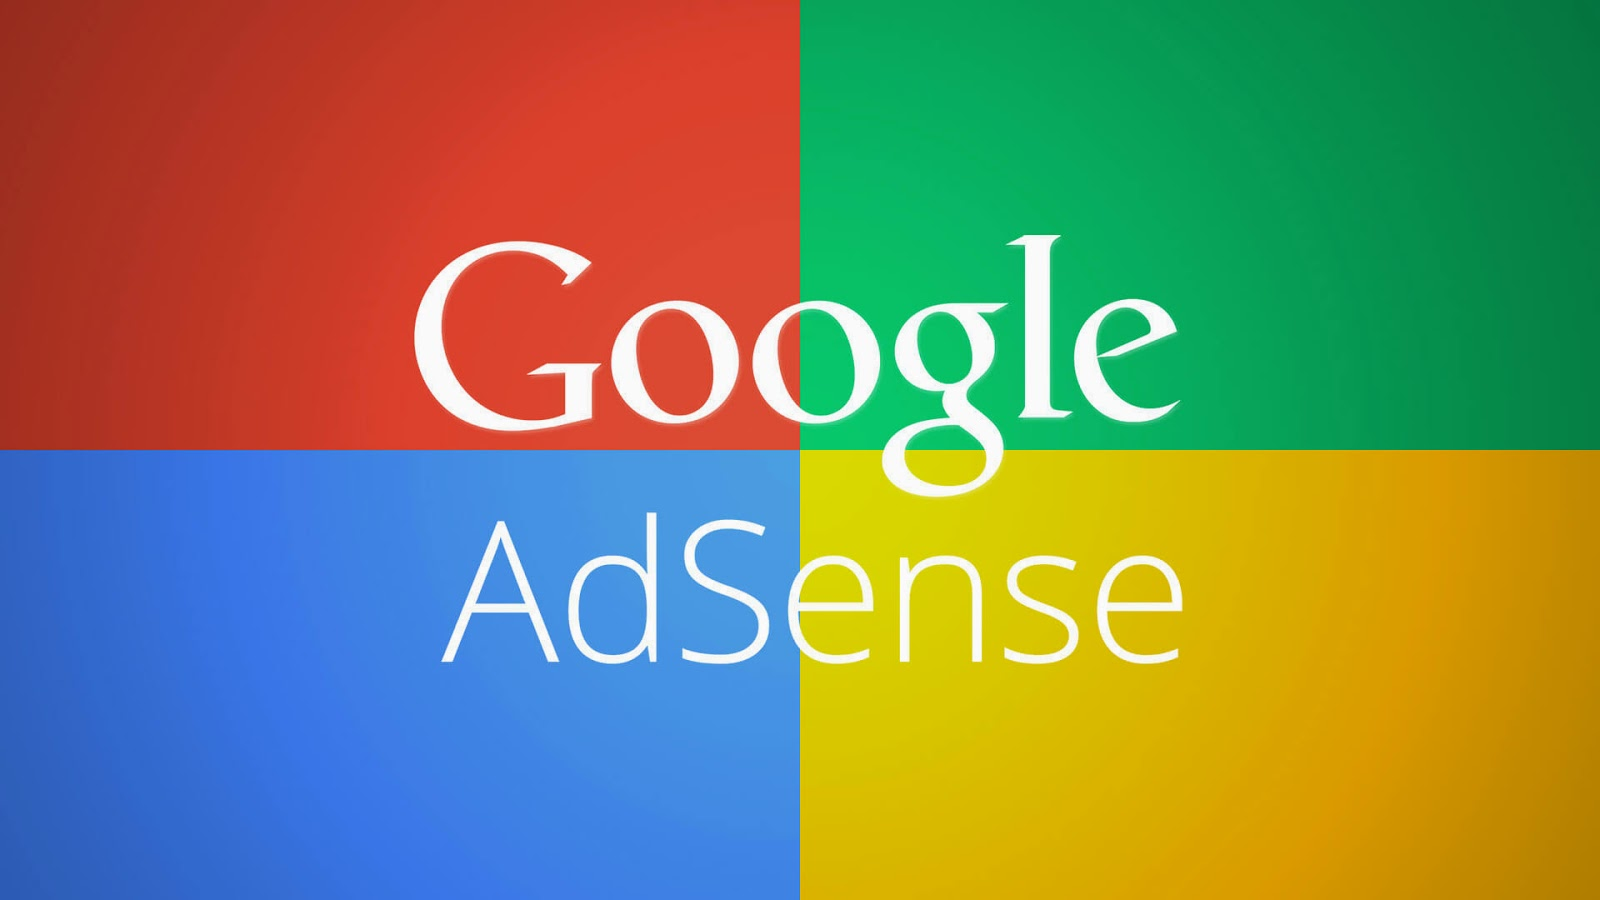 Dapatkah saya mendaftar Adsense dengan Subdomain?